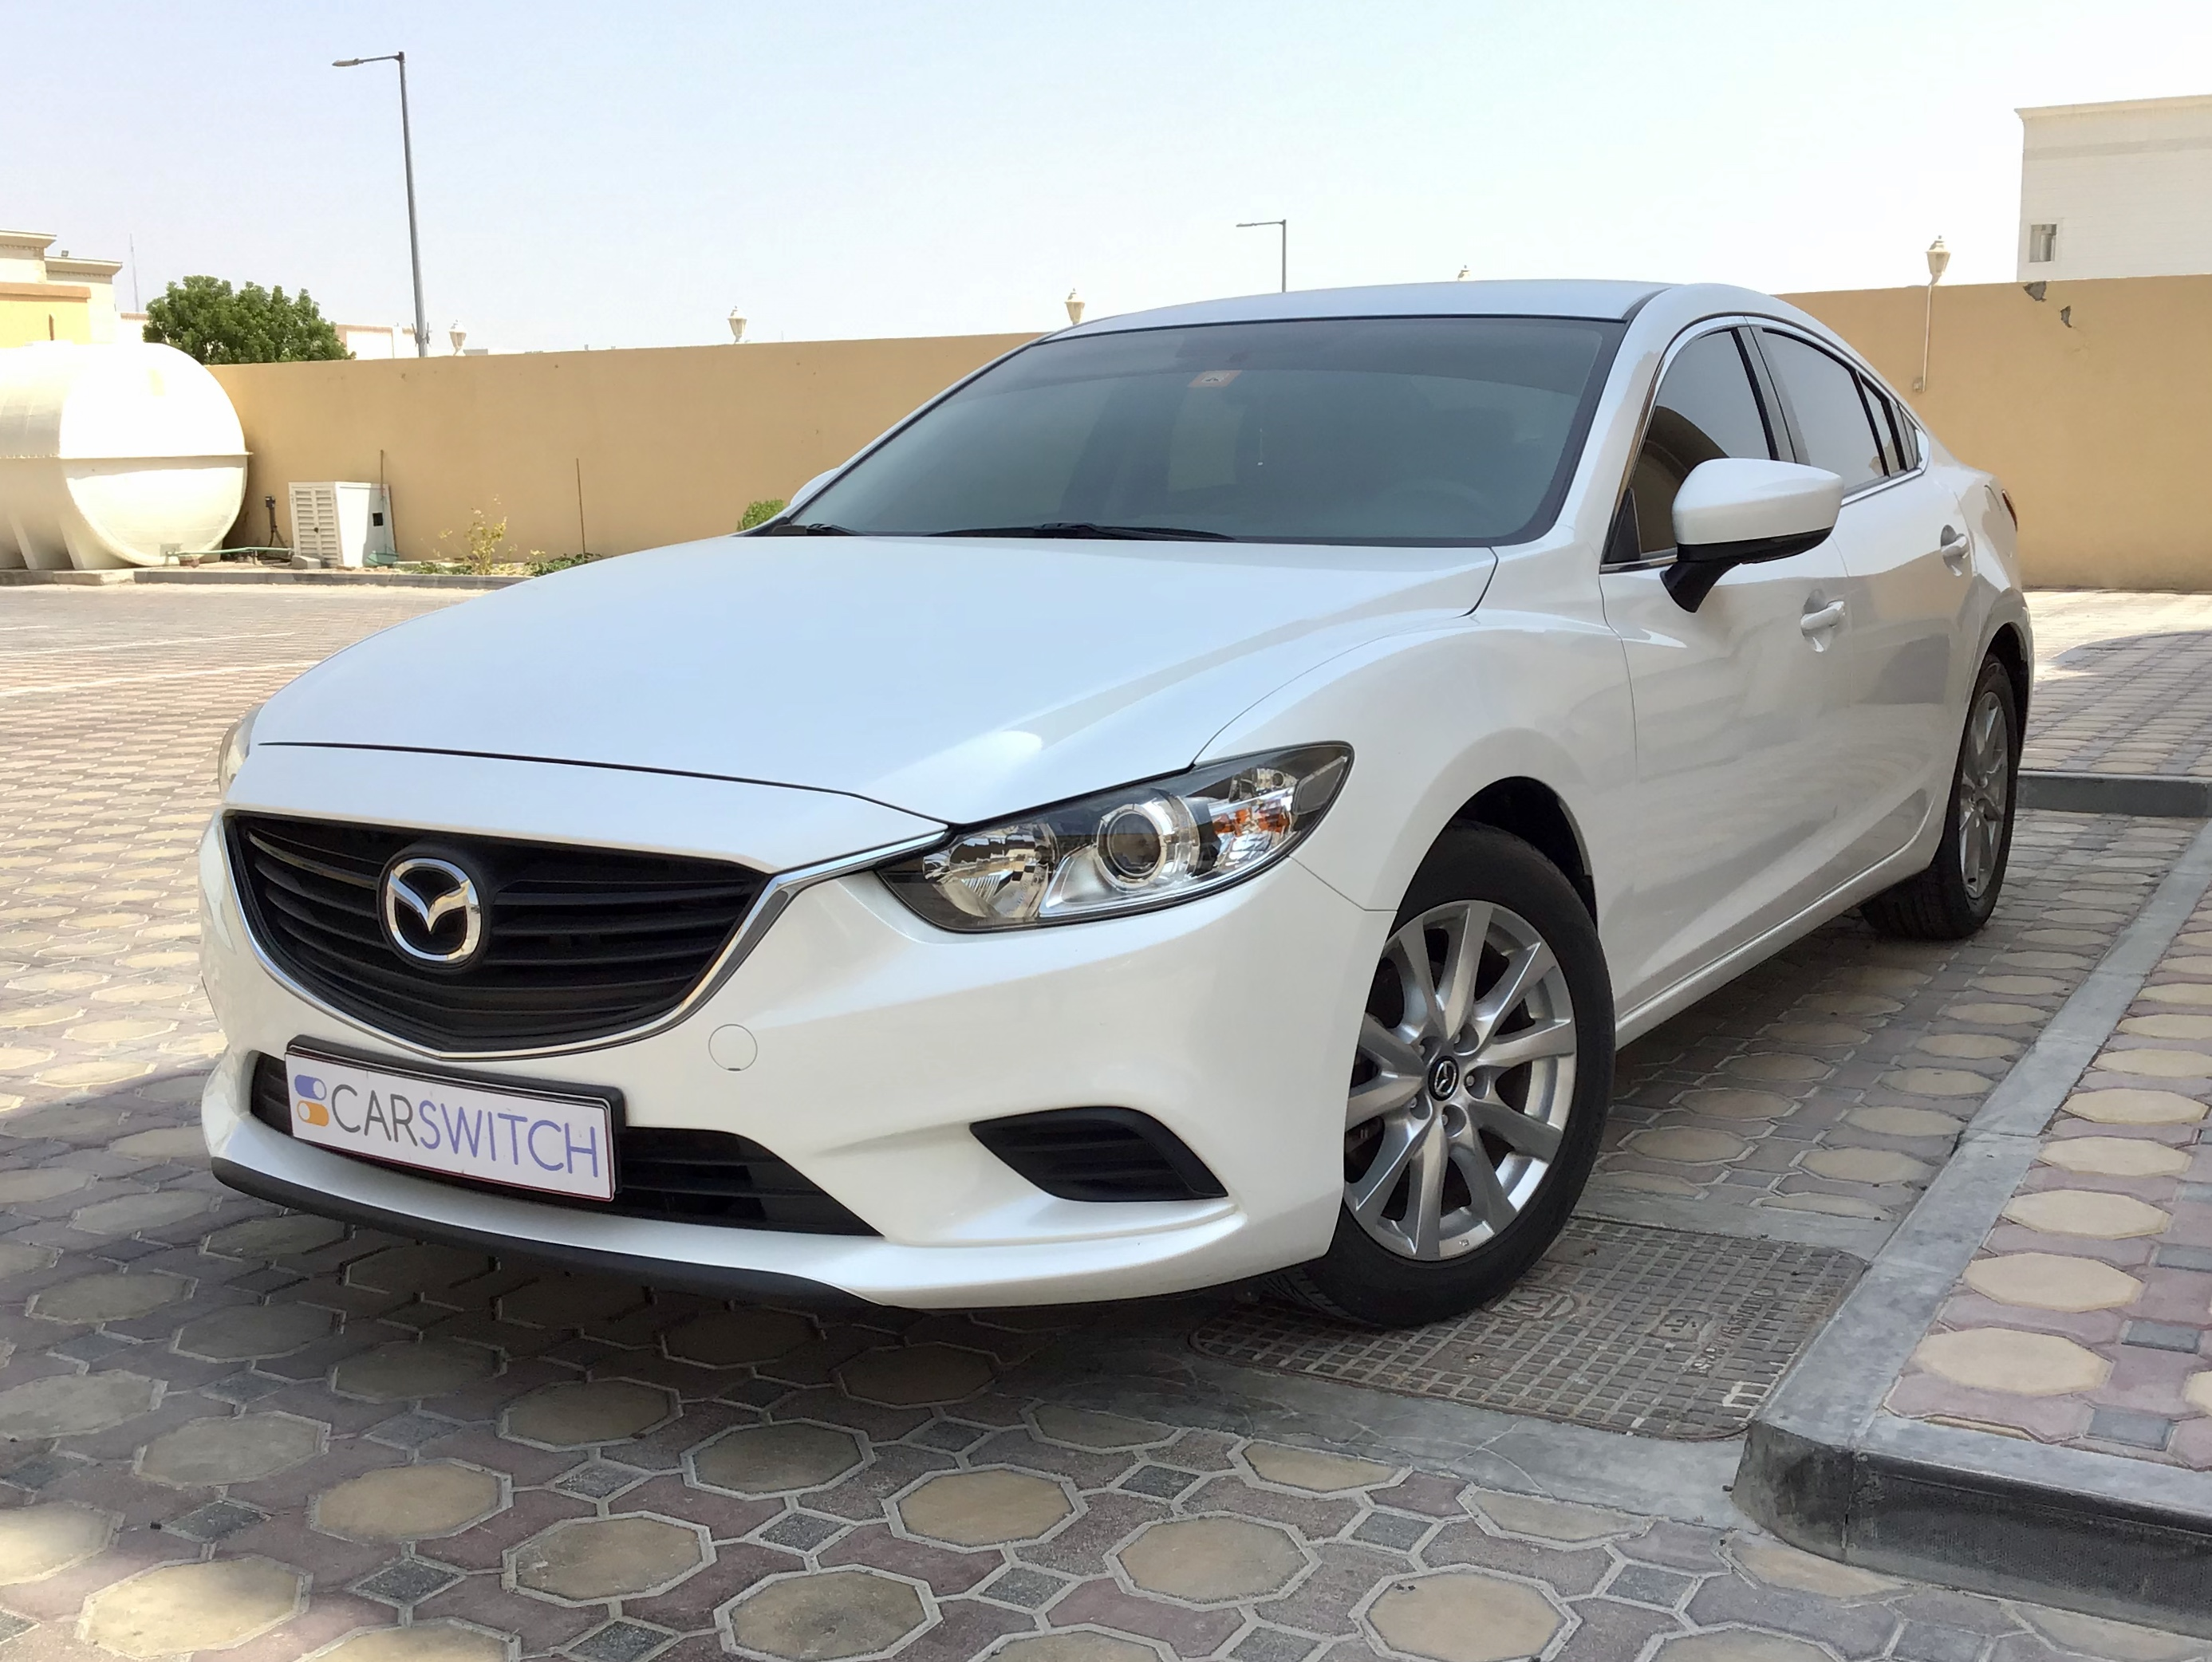 Kelebihan Kekurangan Mazda Mazda6 Tangguh